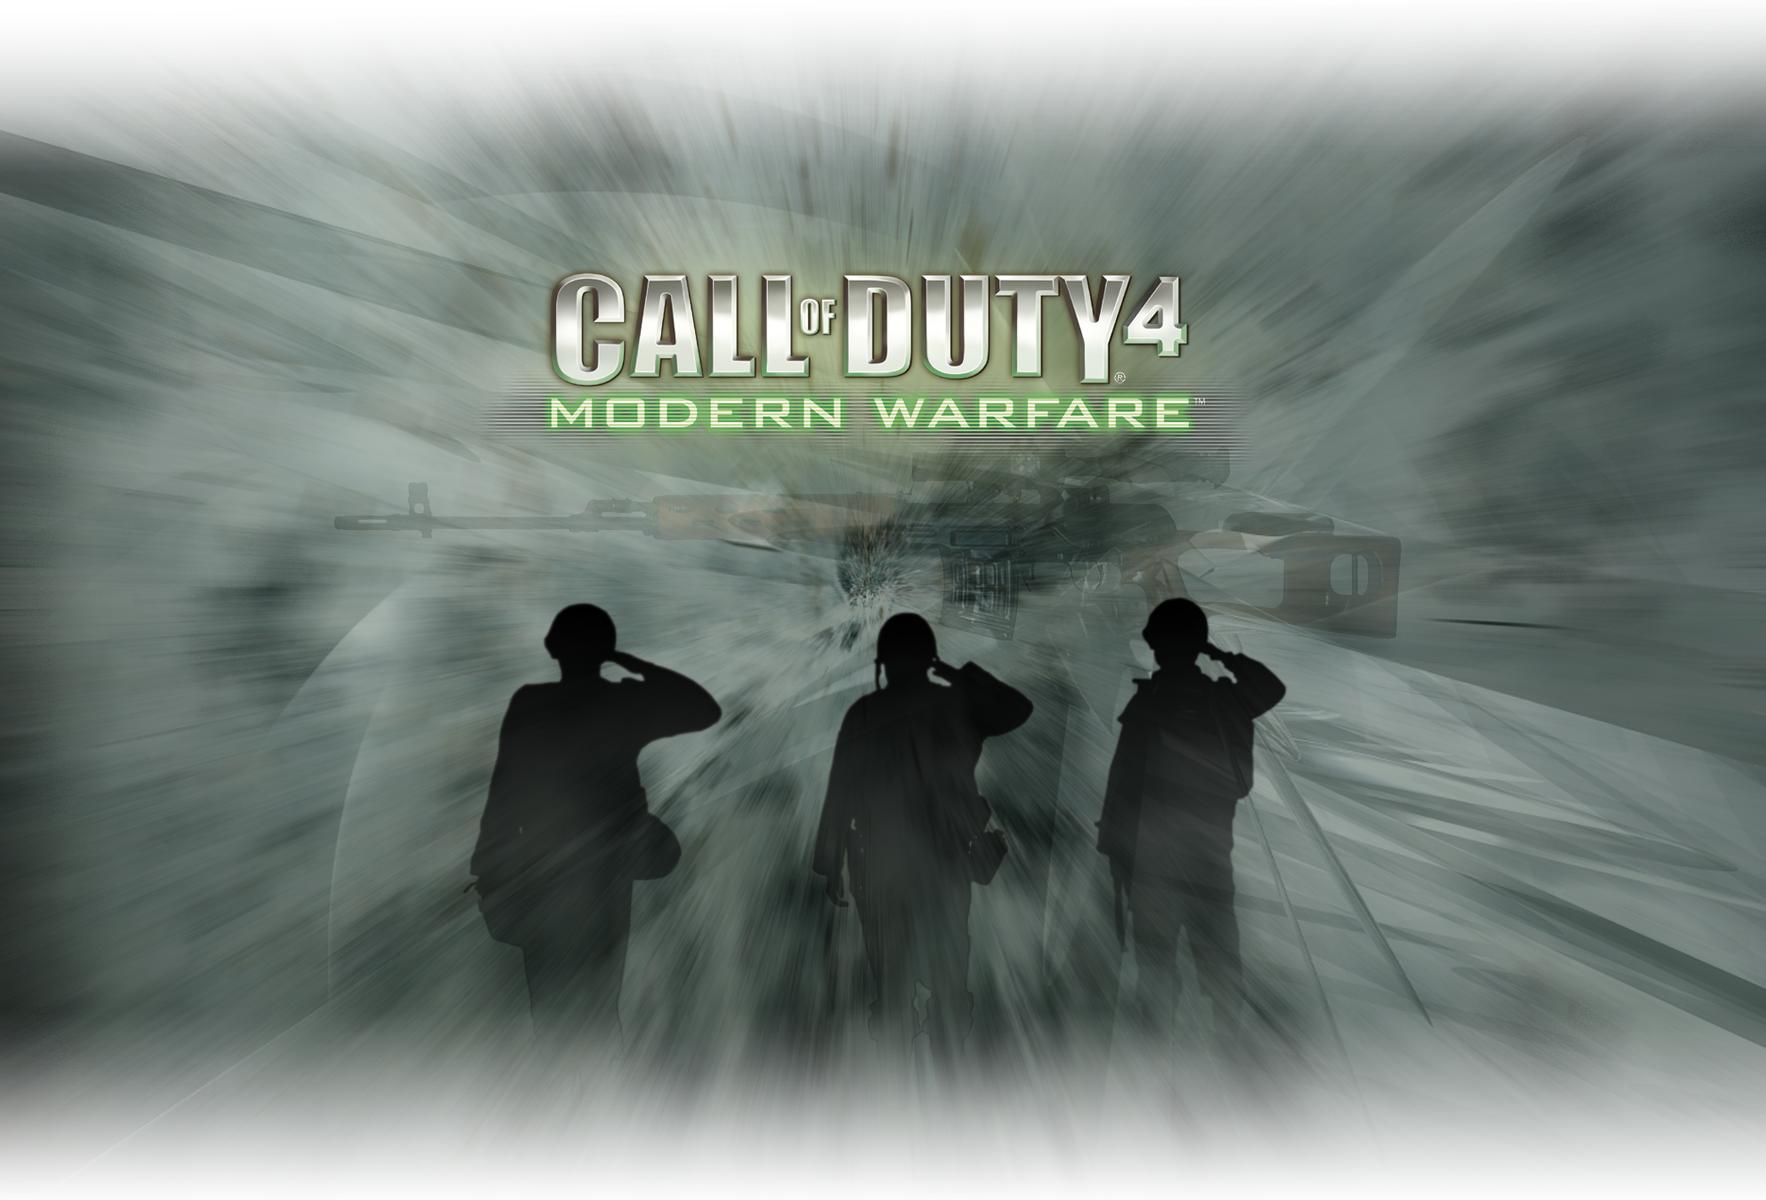 Call Of Duty 4 Wallpaper By Bull53y3 On Deviantart